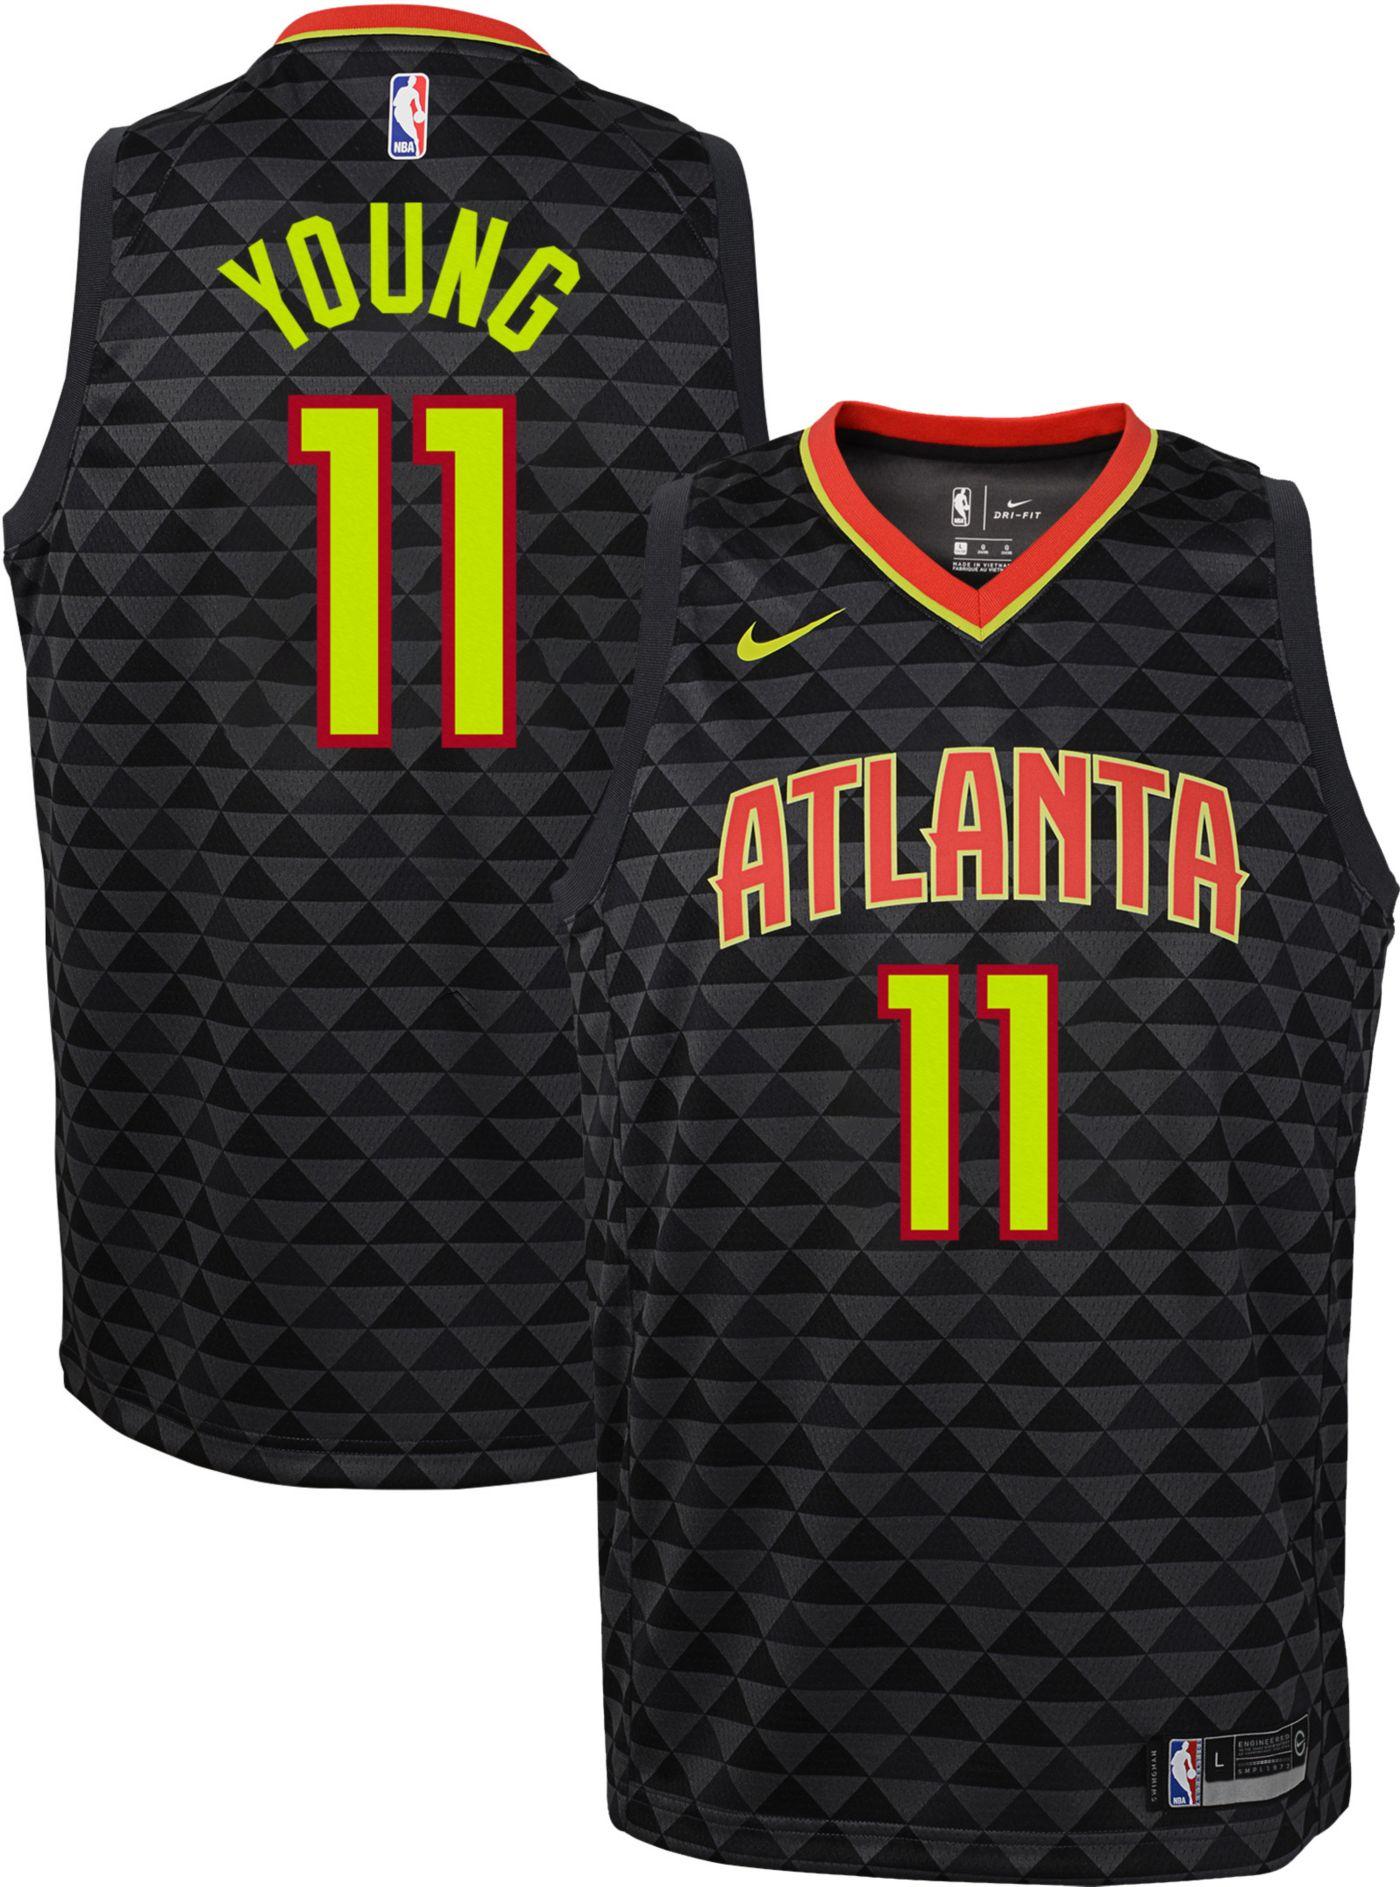 Nike Youth Atlanta Hawks Trae Young #11 Black Dri-FIT Swingman Jersey